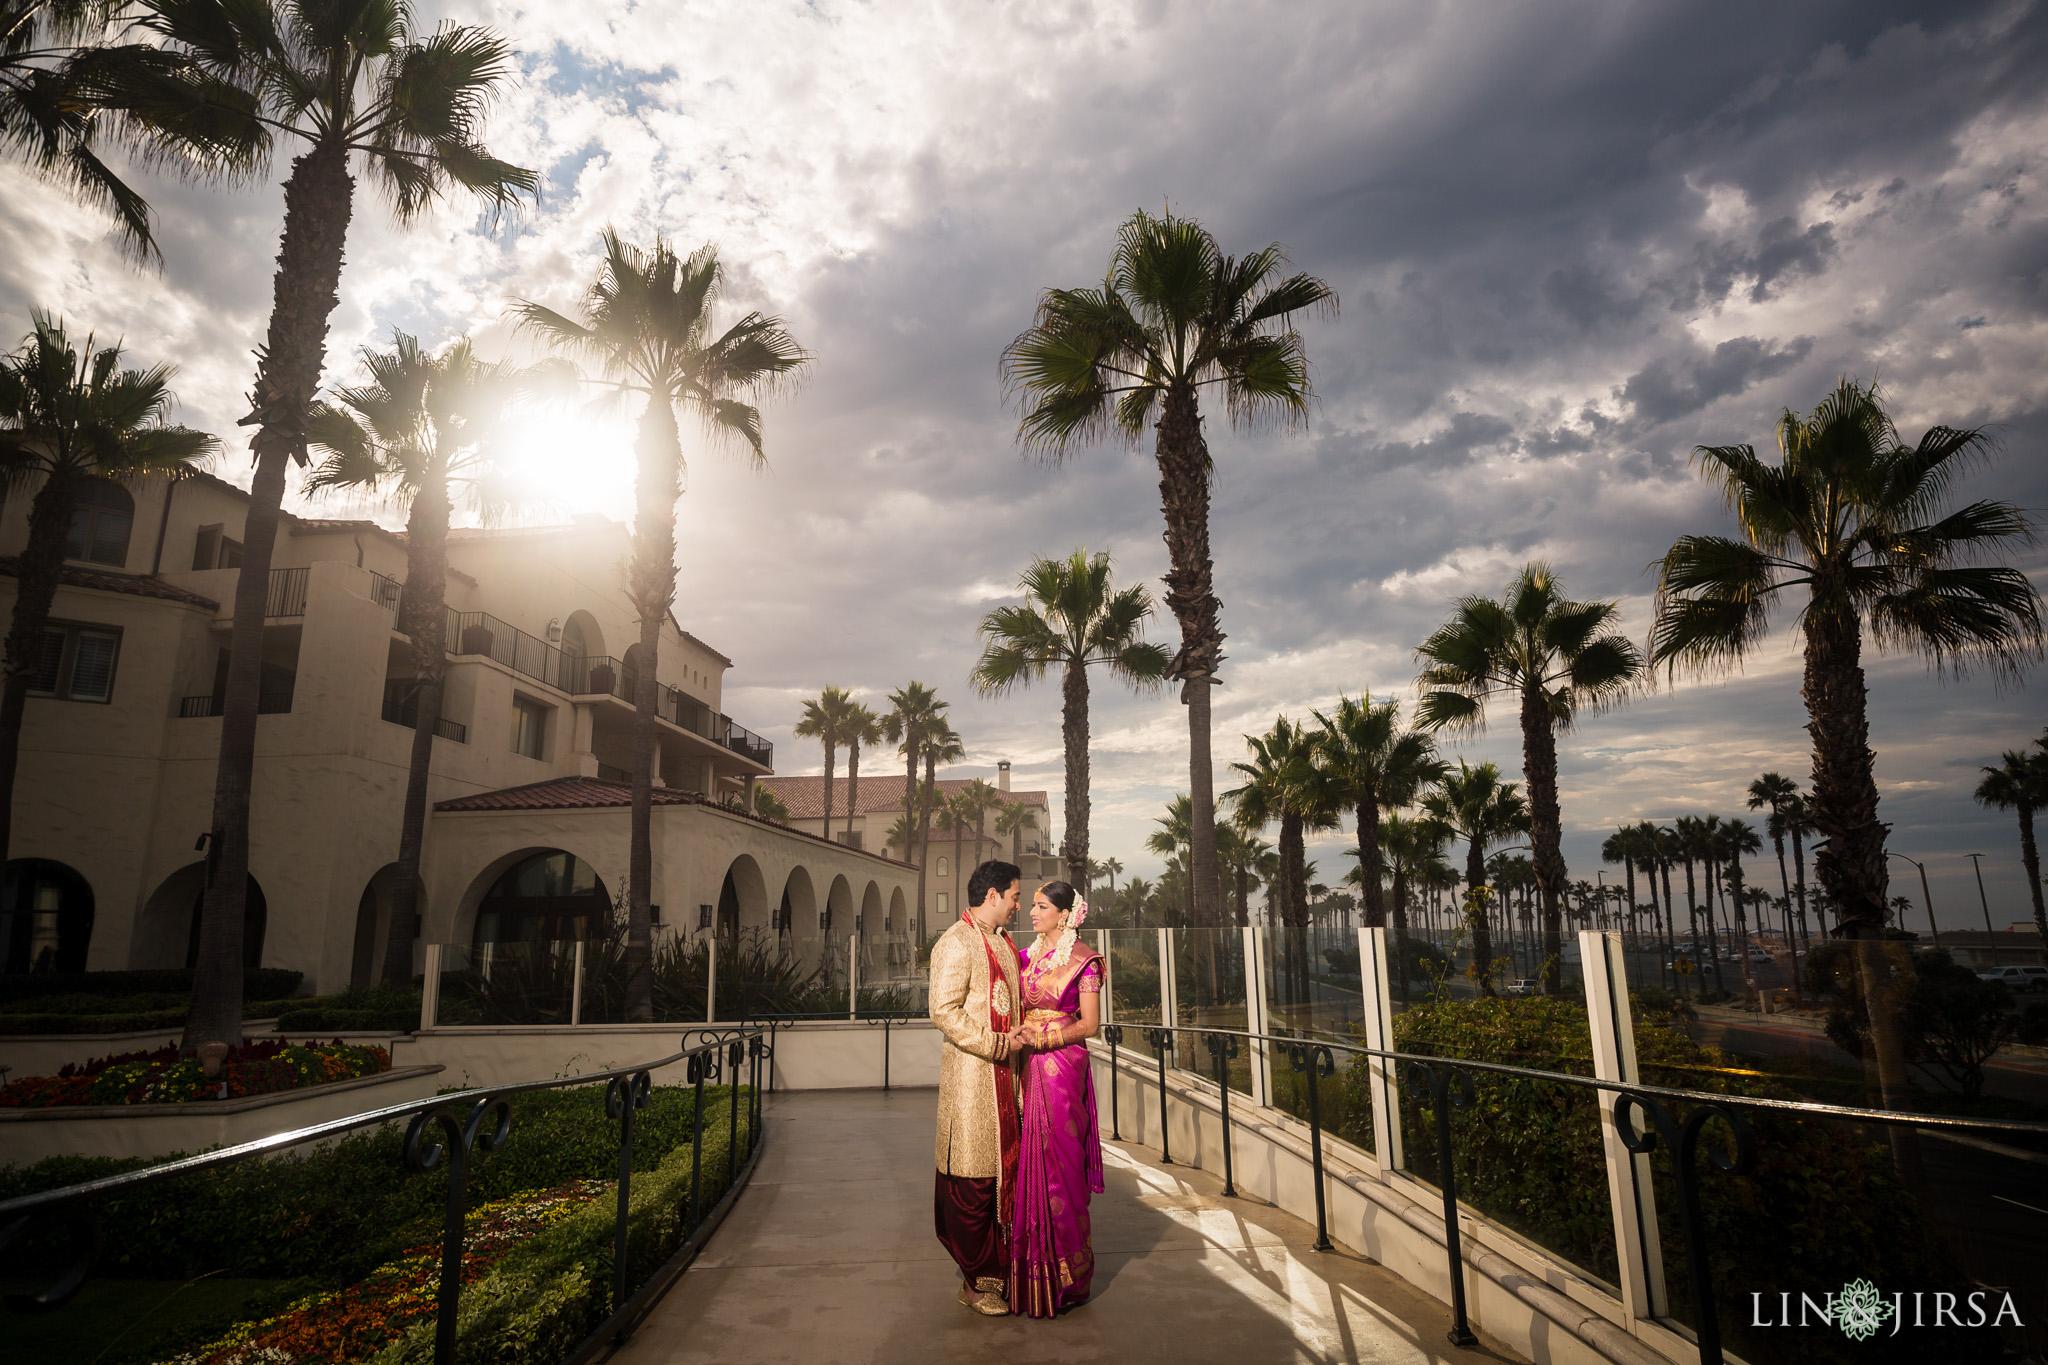 Bridal Party Photos At Hyatt Regency Huntington Beach 004 Wedding Photography